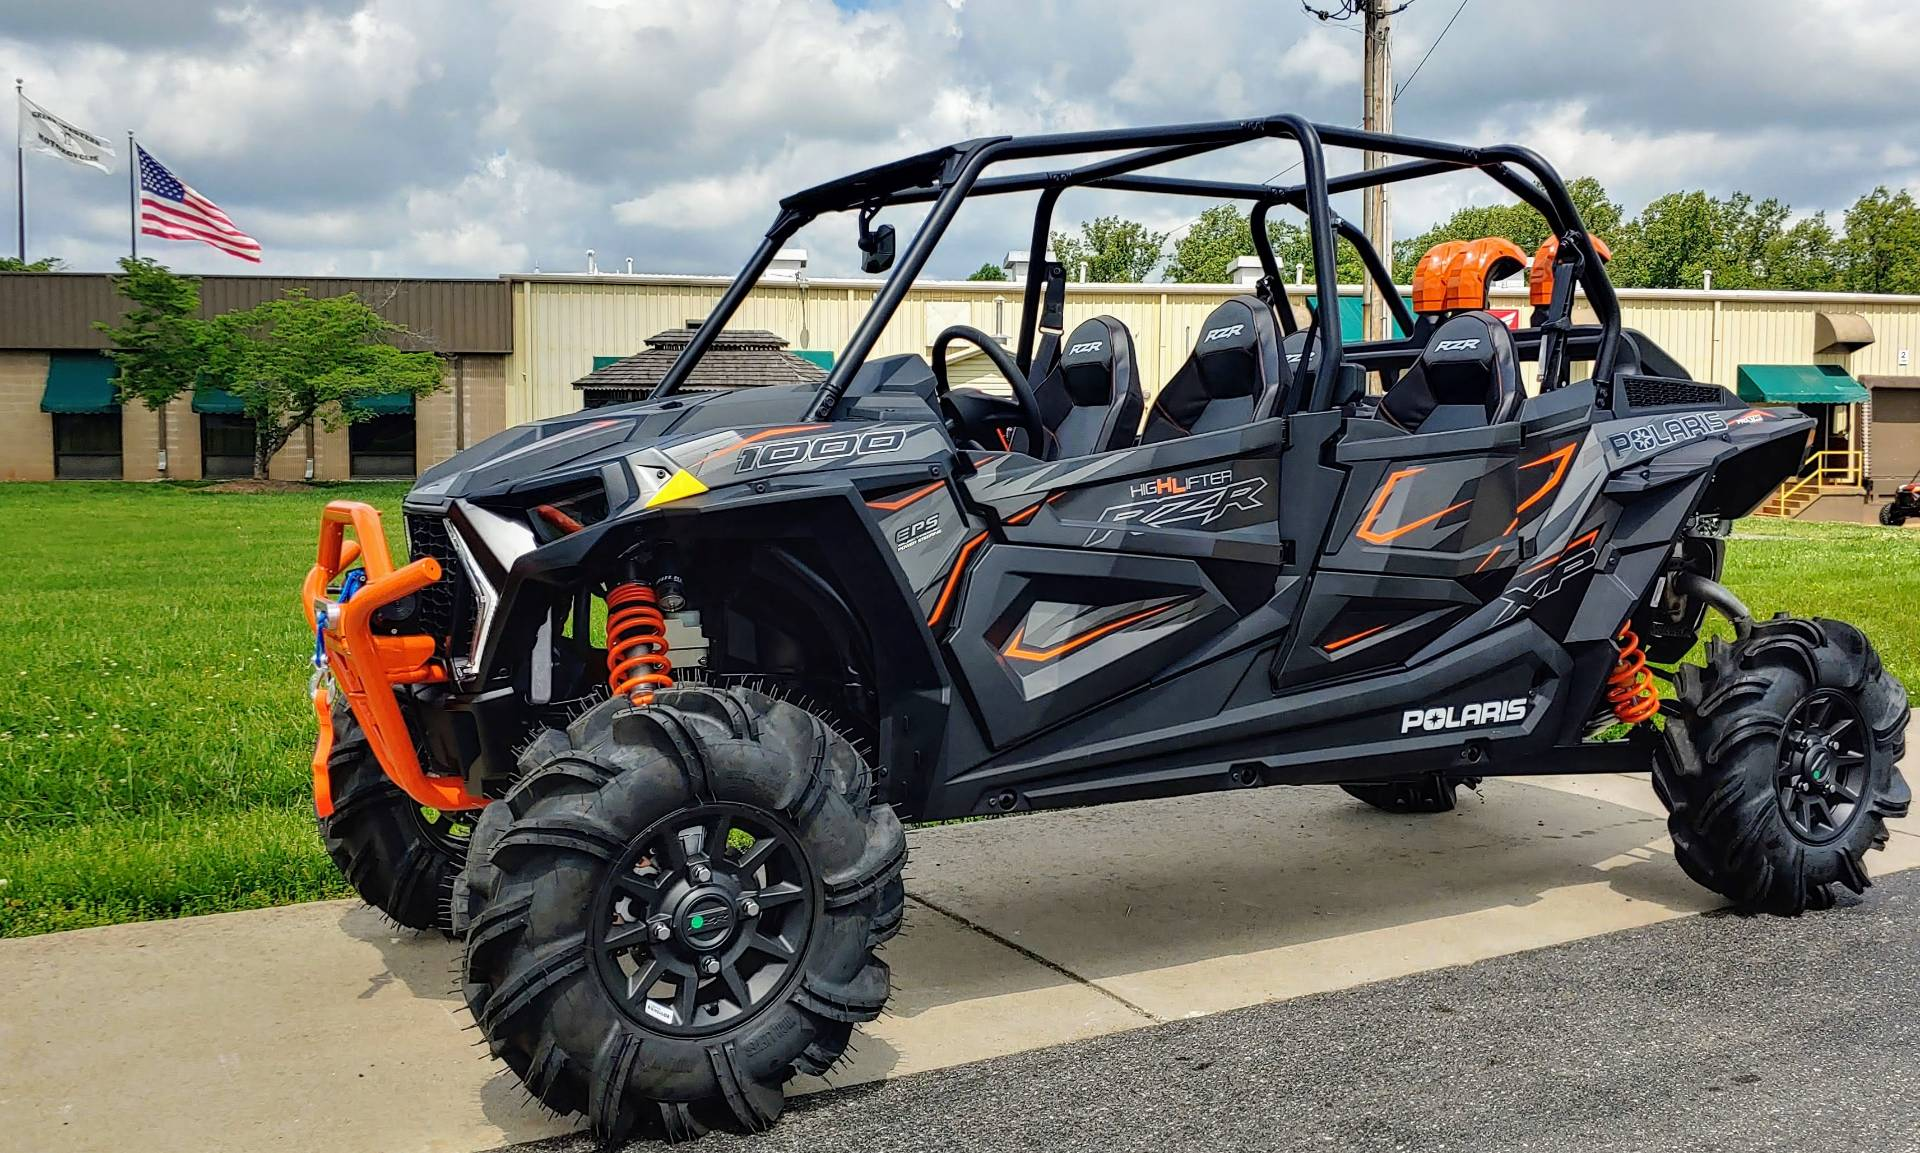 Polaris Rzr 1000 4 Seater >> 2019 Polaris Rzr Xp 4 1000 High Lifter In Statesville North Carolina